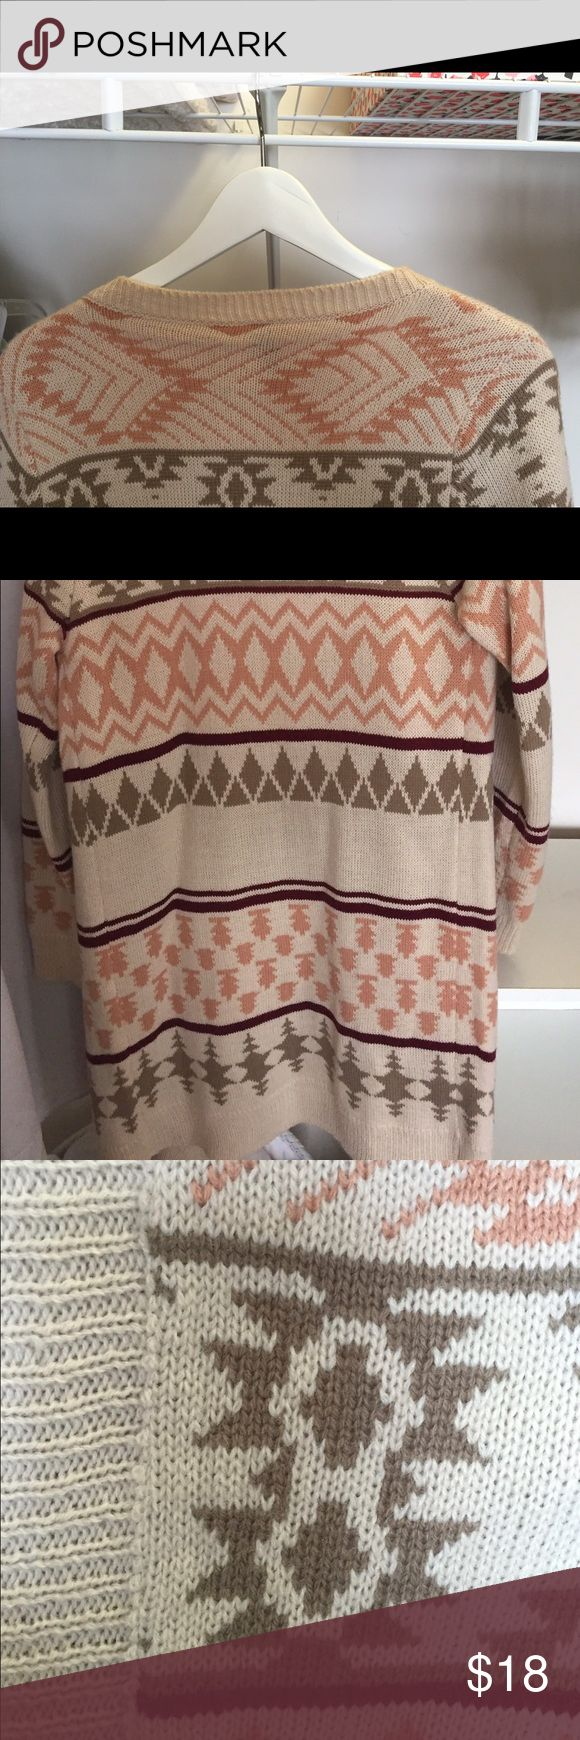 Selling this Aztec print, ribbed trim, waterfall cardigan. in my Poshmark closet! My username is: jessinanicole. #shopmycloset #poshmark #fashion #shopping #style #forsale #WINDSOR #Sweaters